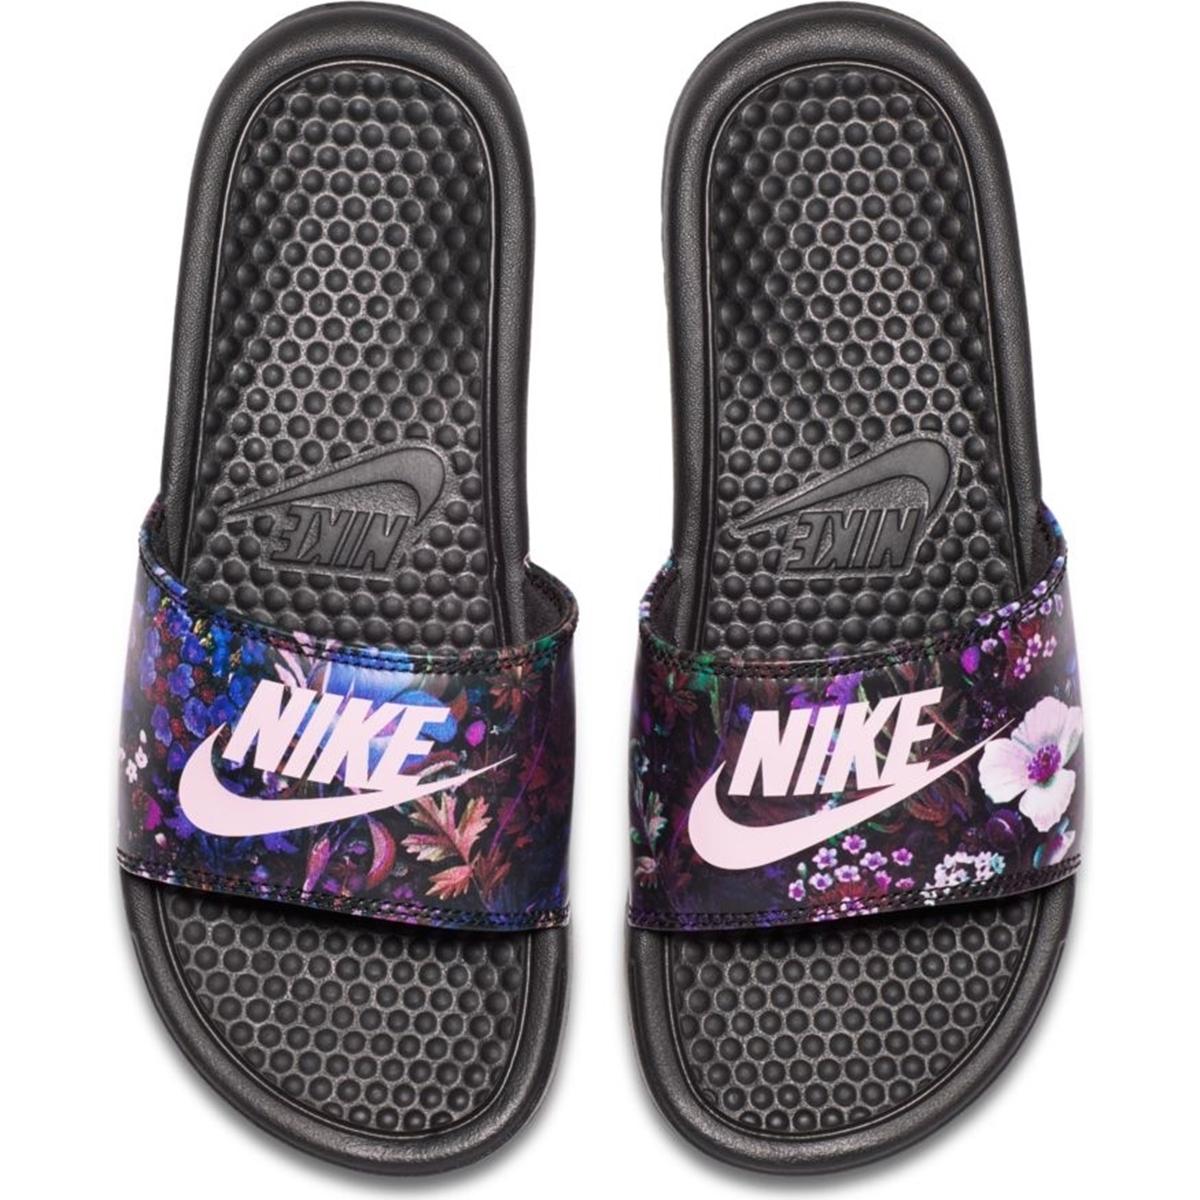 ba6be003de0 Nike Air Zoom Pegasus 35 Neutral Color Shoes Mens Nike Jordan 6 Size ...